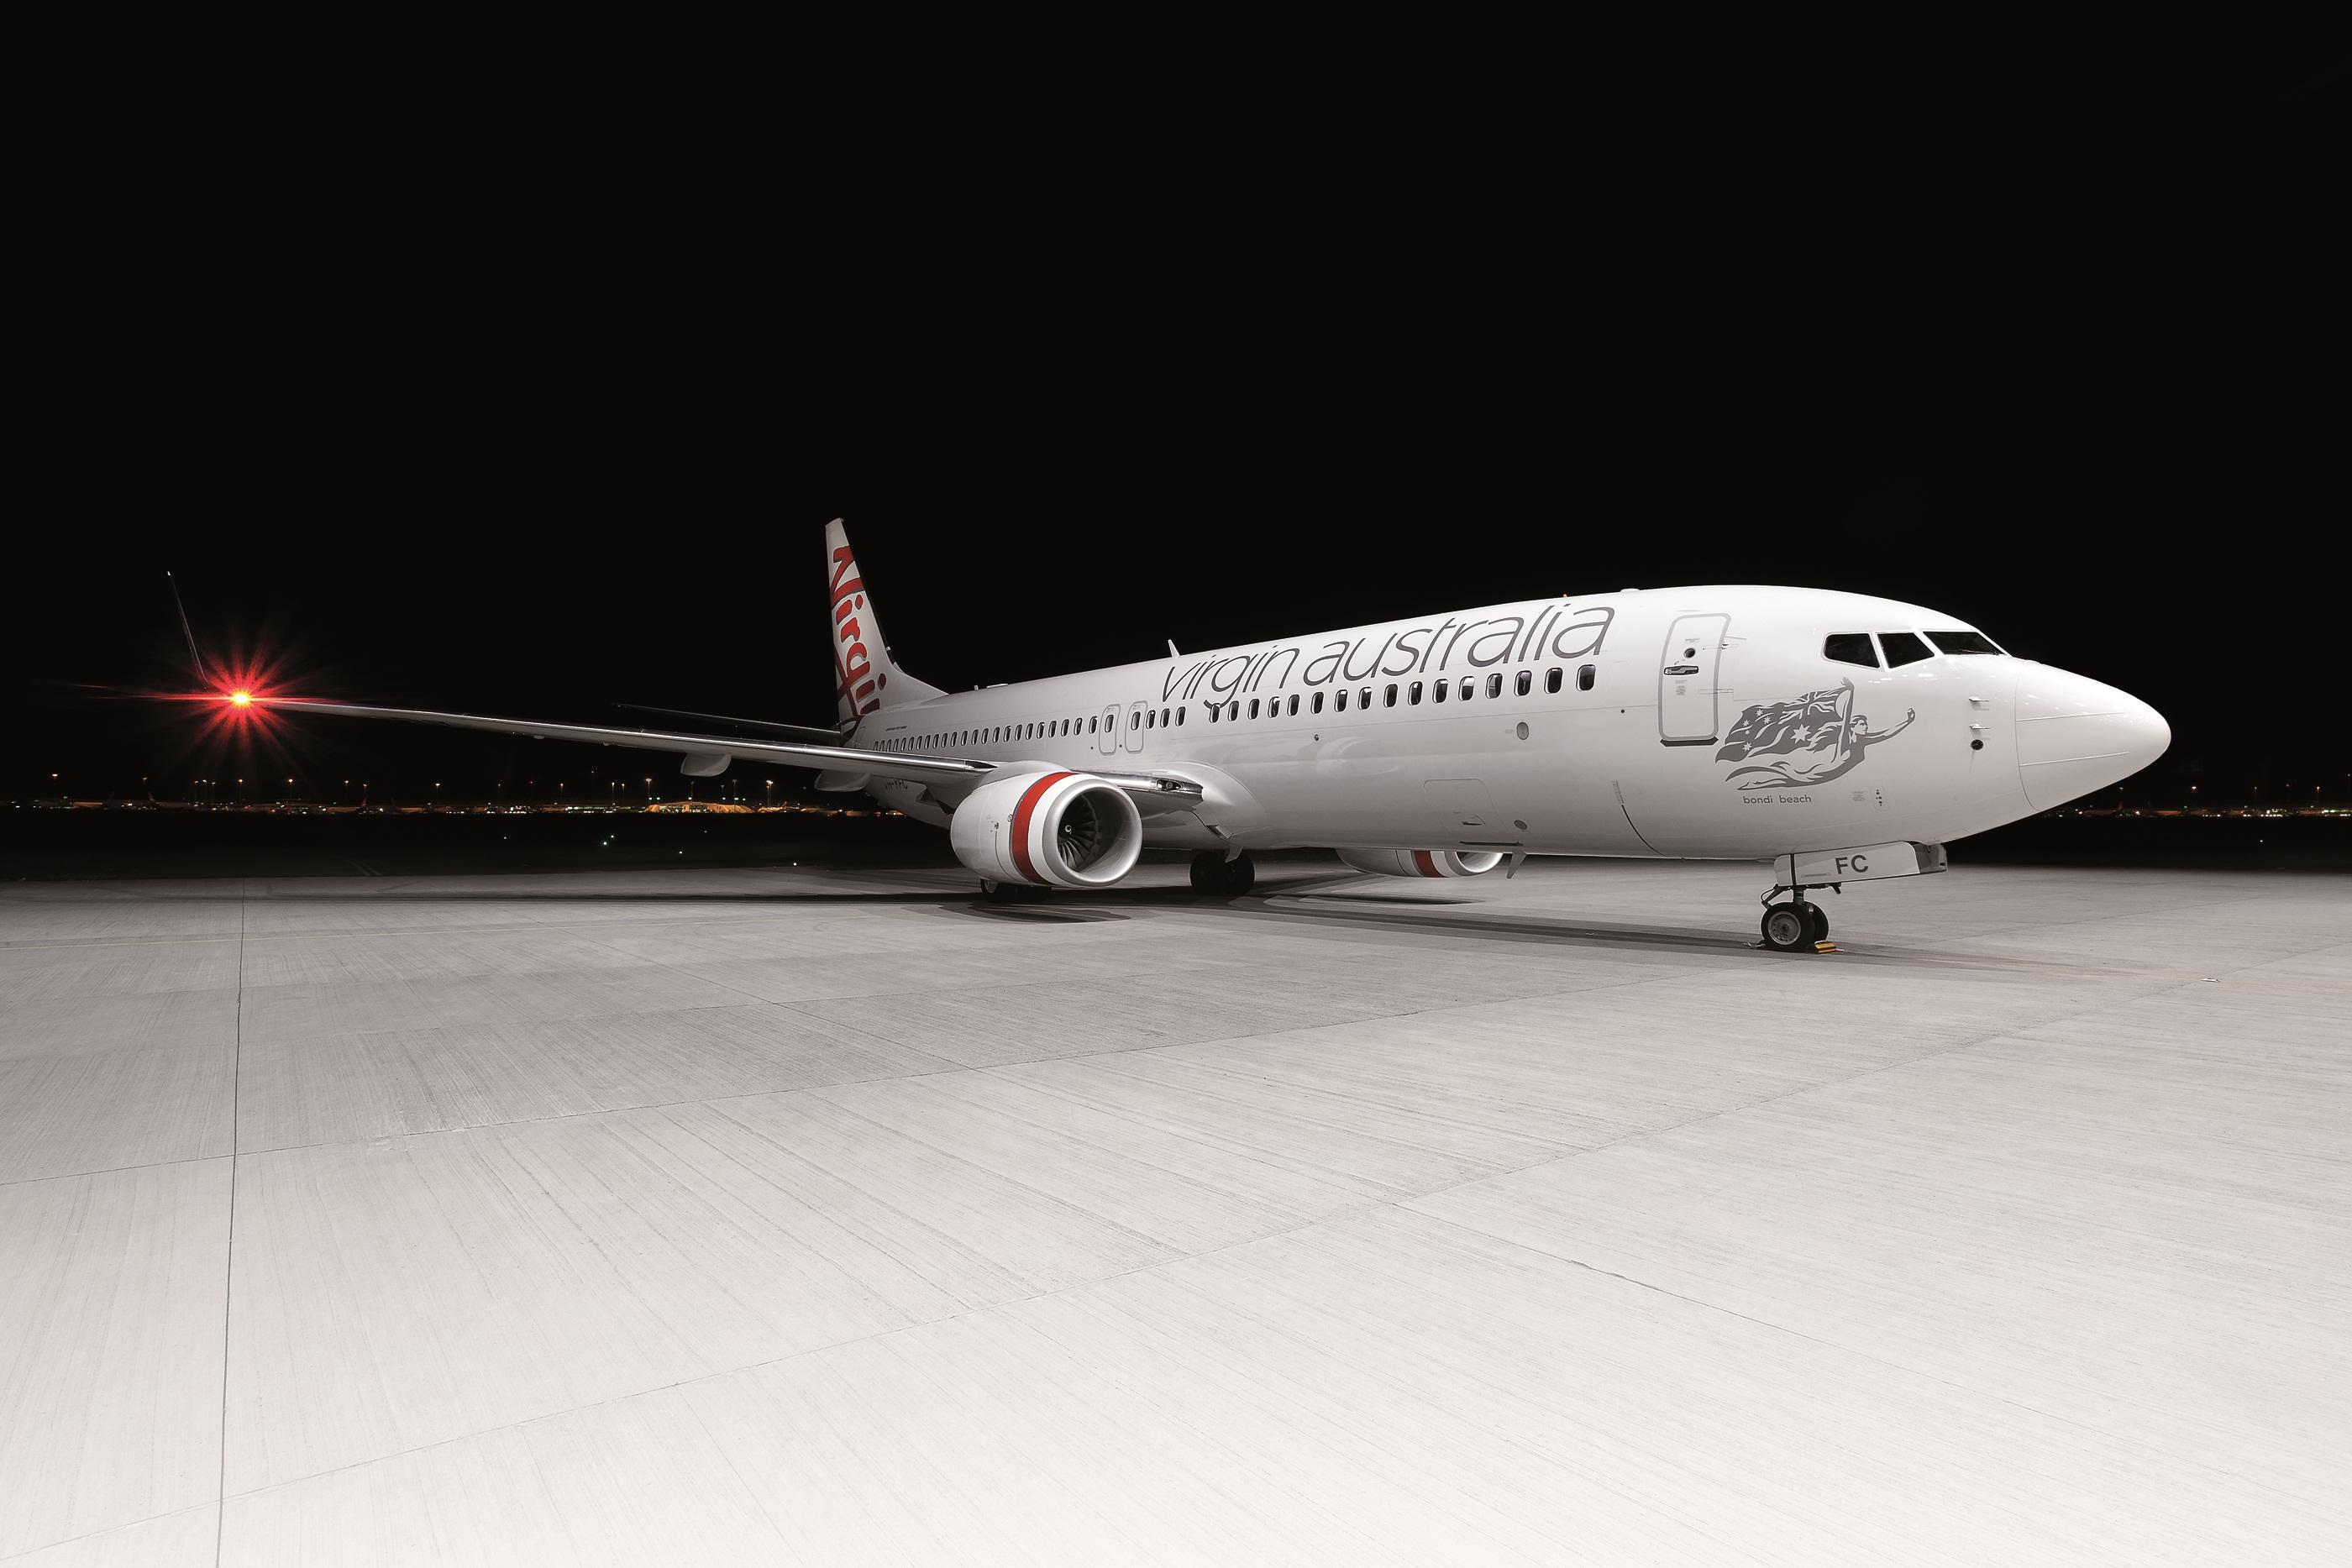 Virgin Aust Plane Nighttime